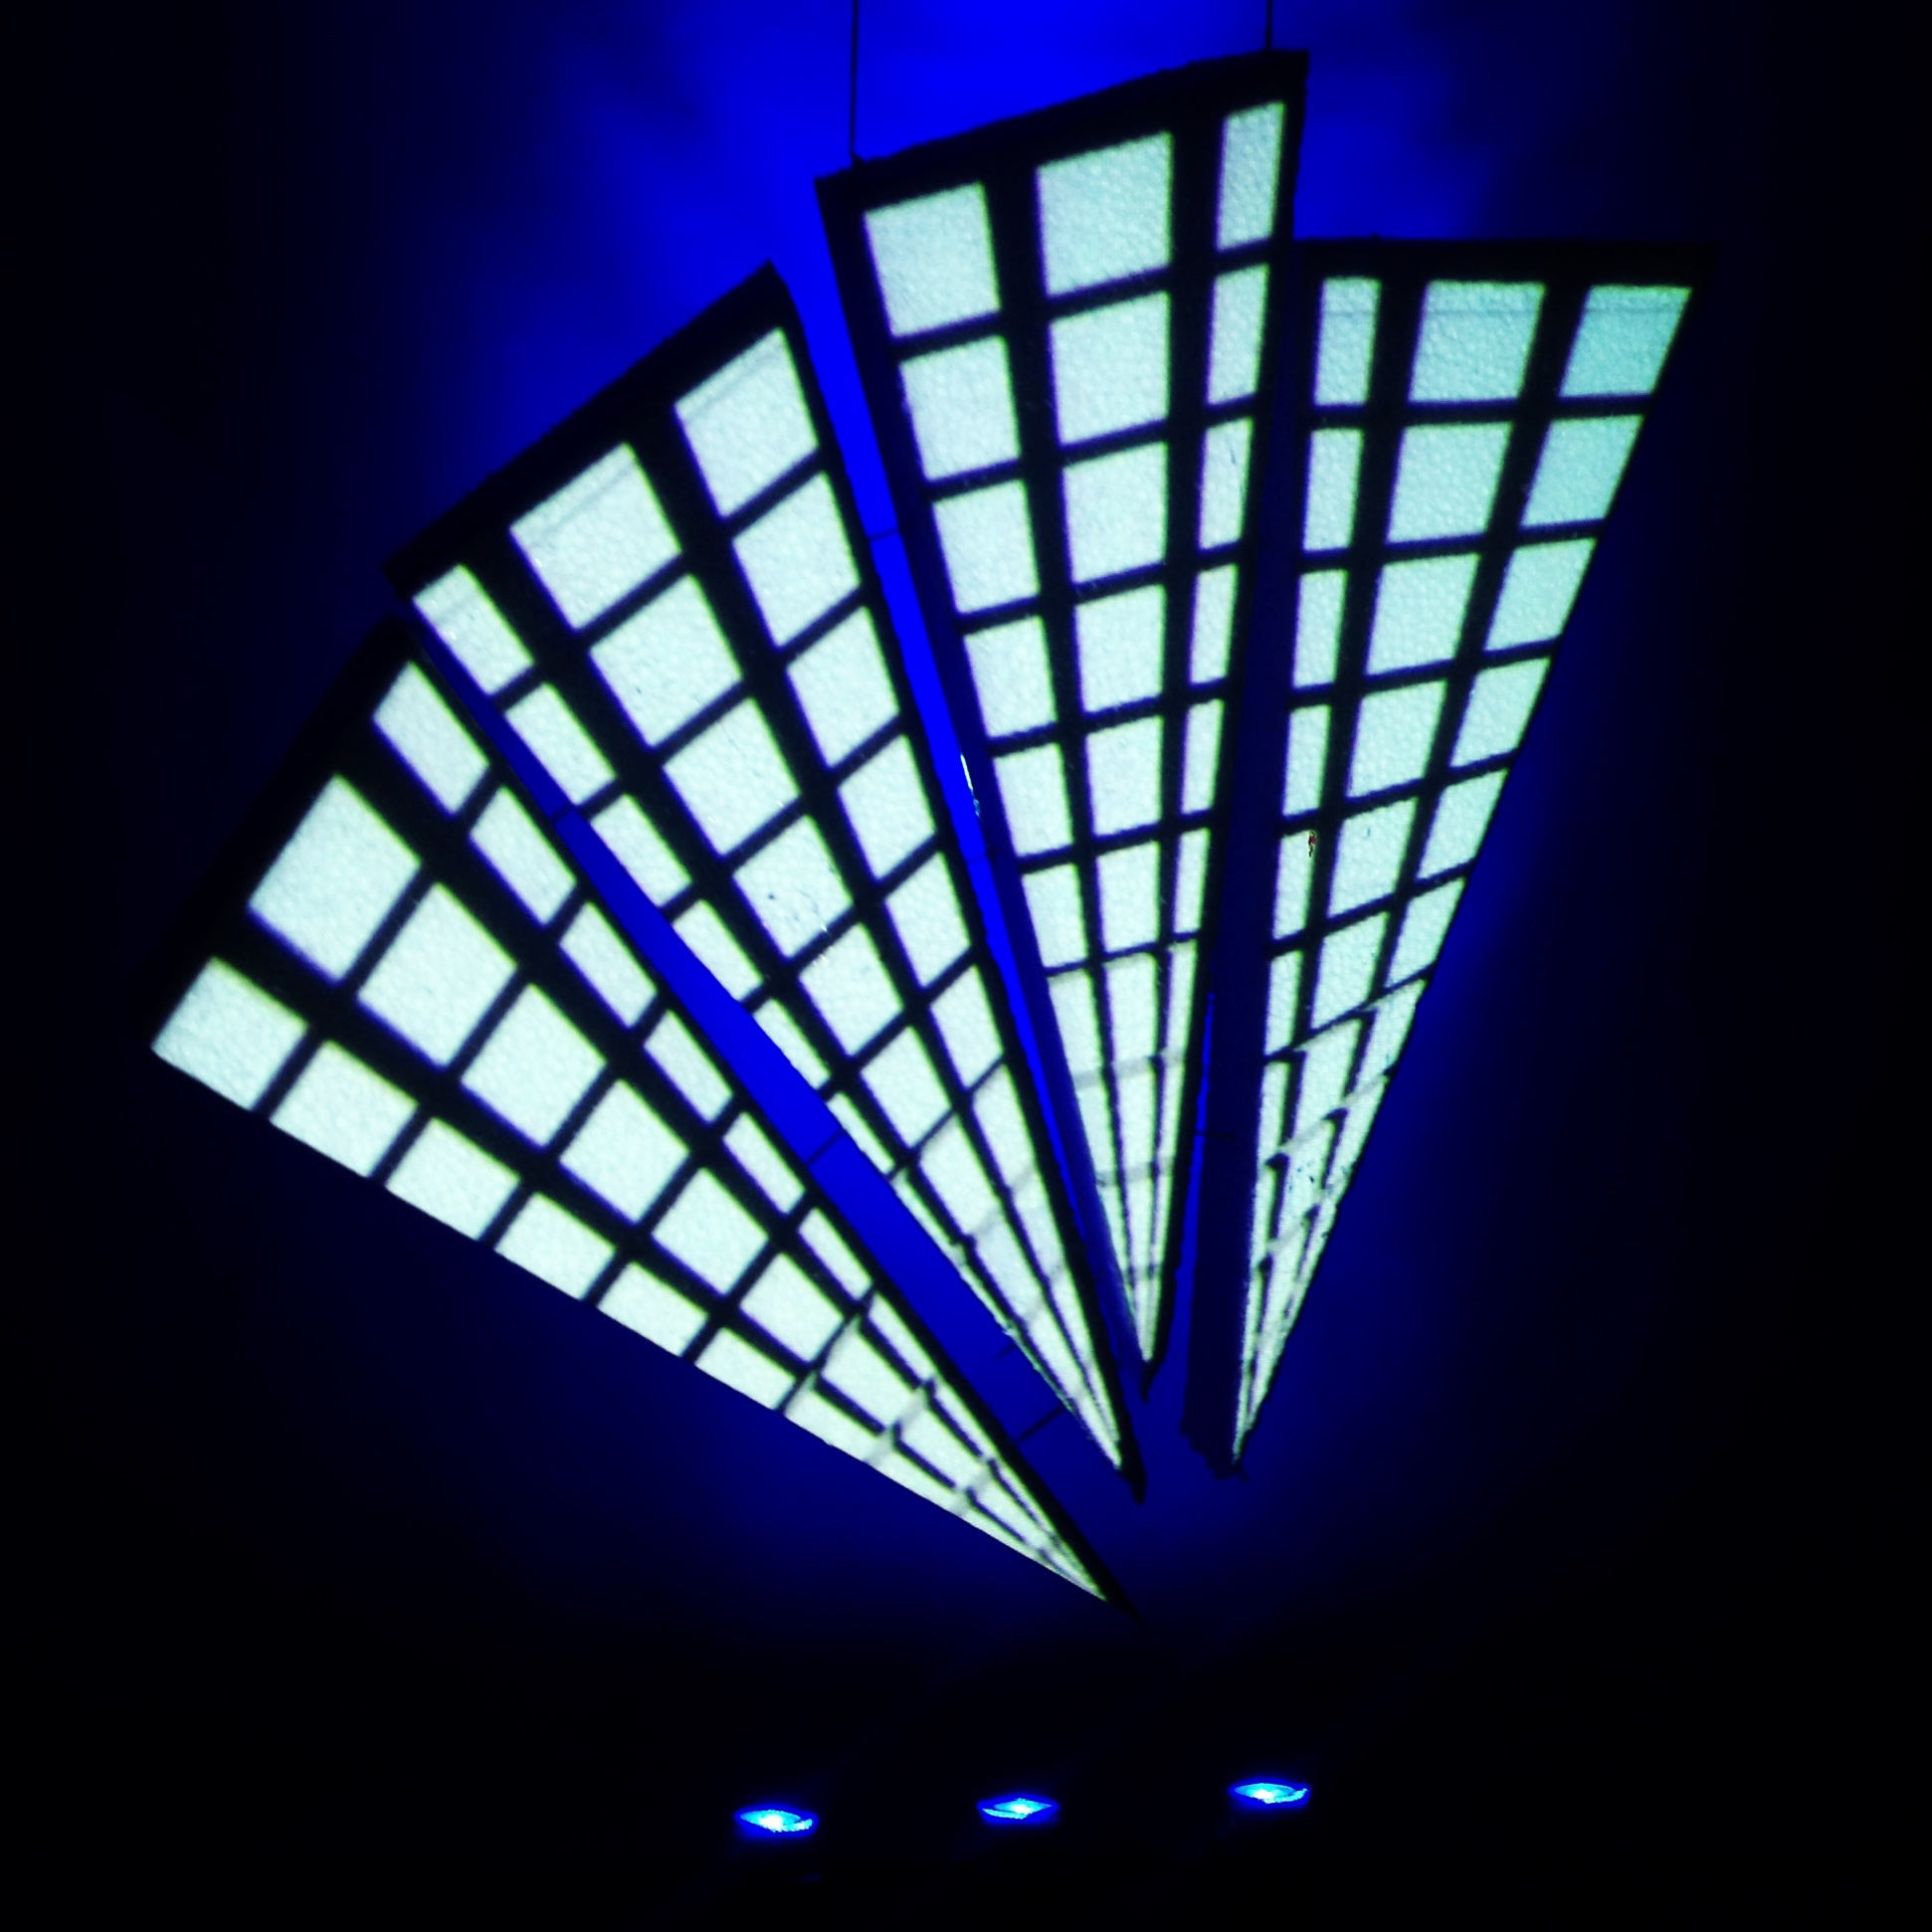 LIGHT / SPACE